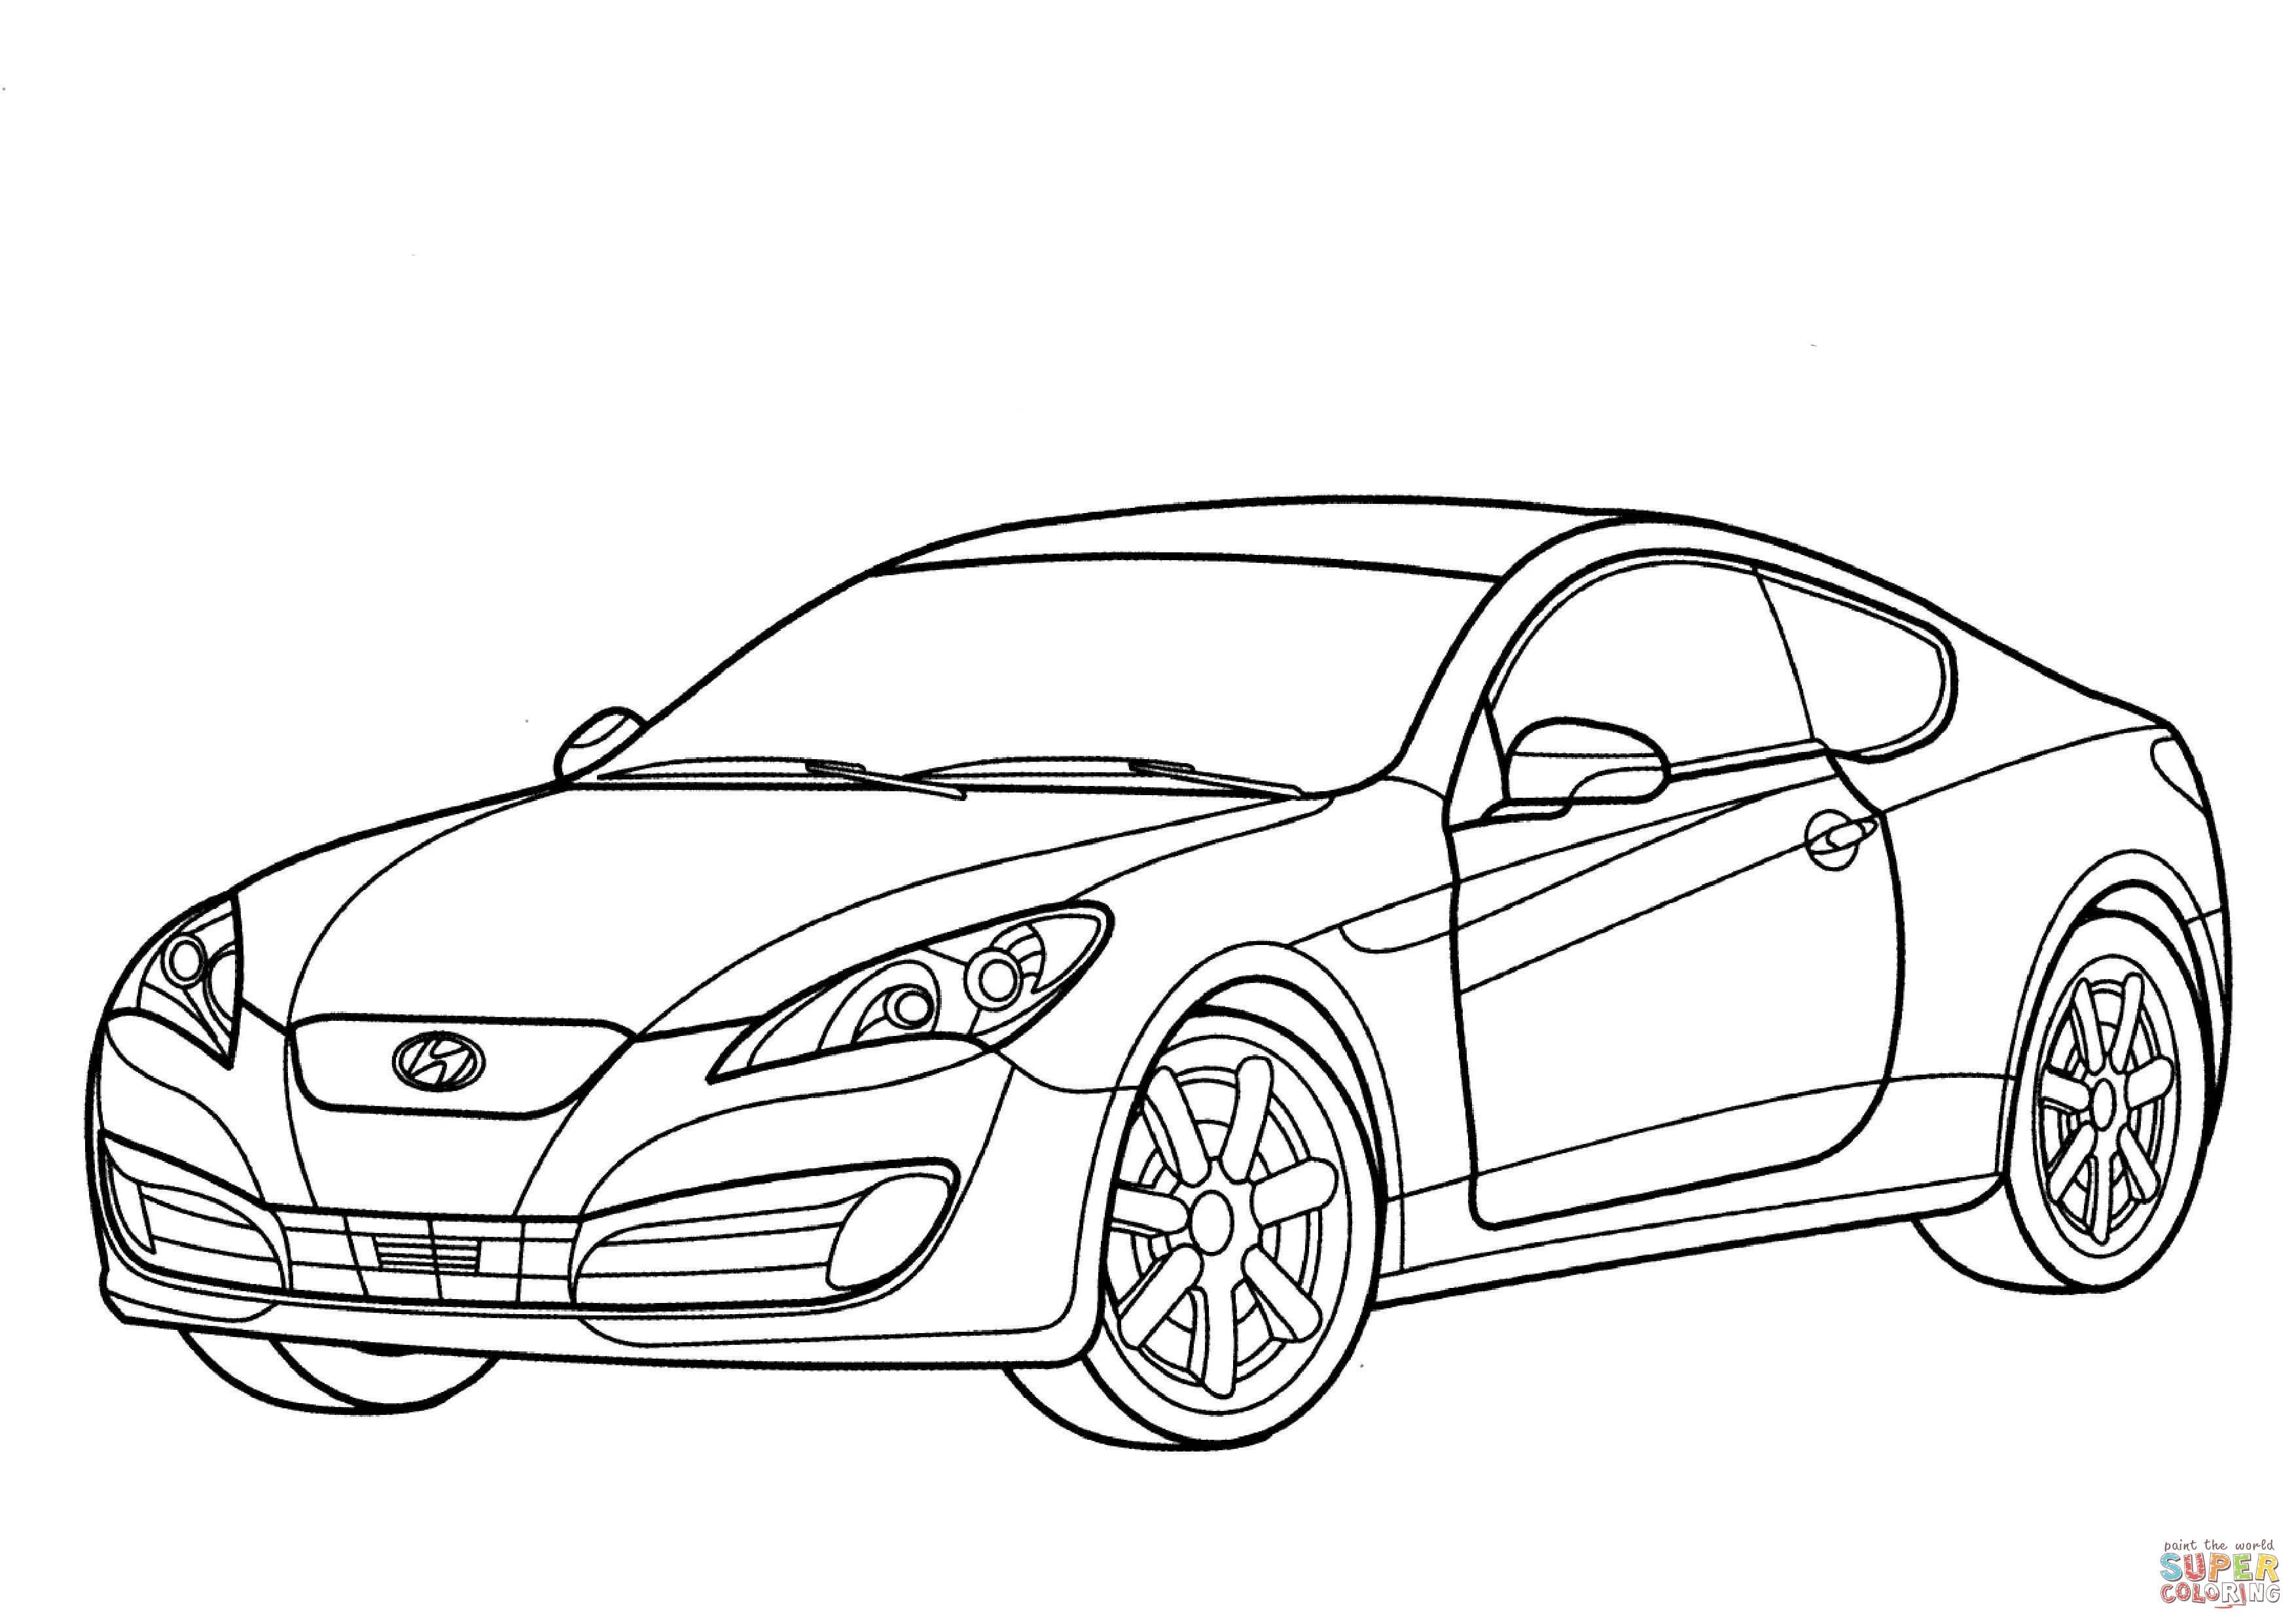 Desenho De Hyundai Genesis Cupe Para Colorir